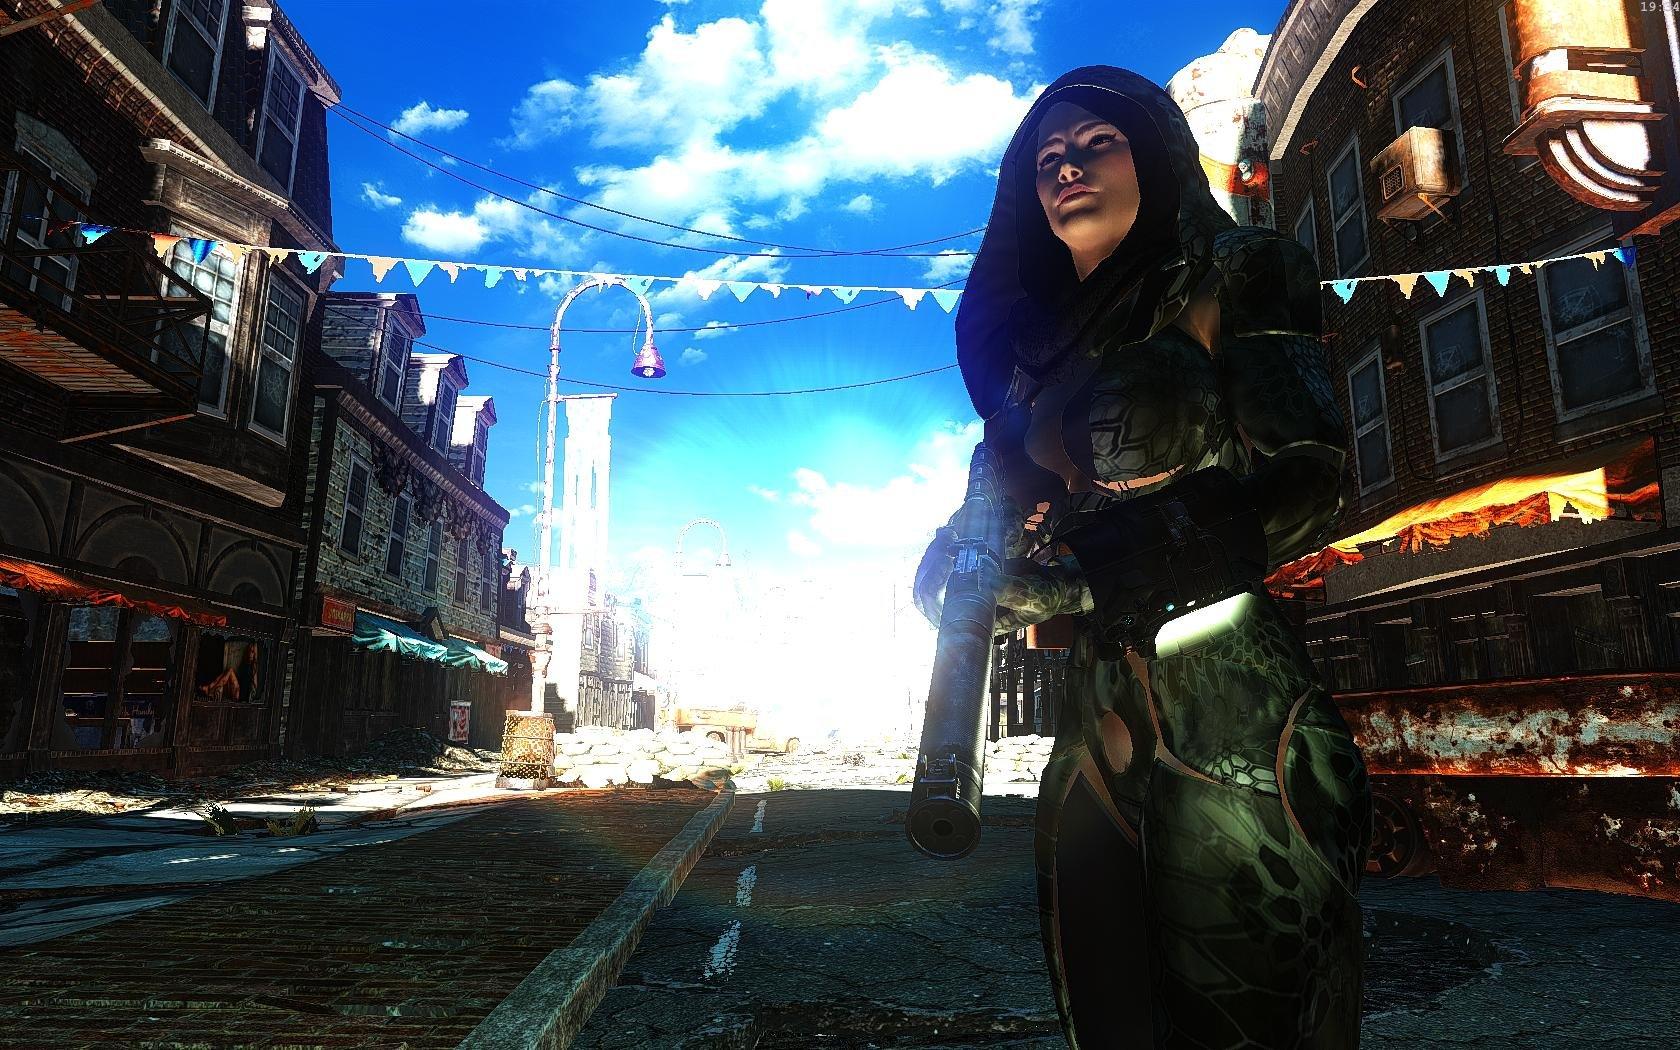 Fallout4 2019-01-15 19-34-11-65